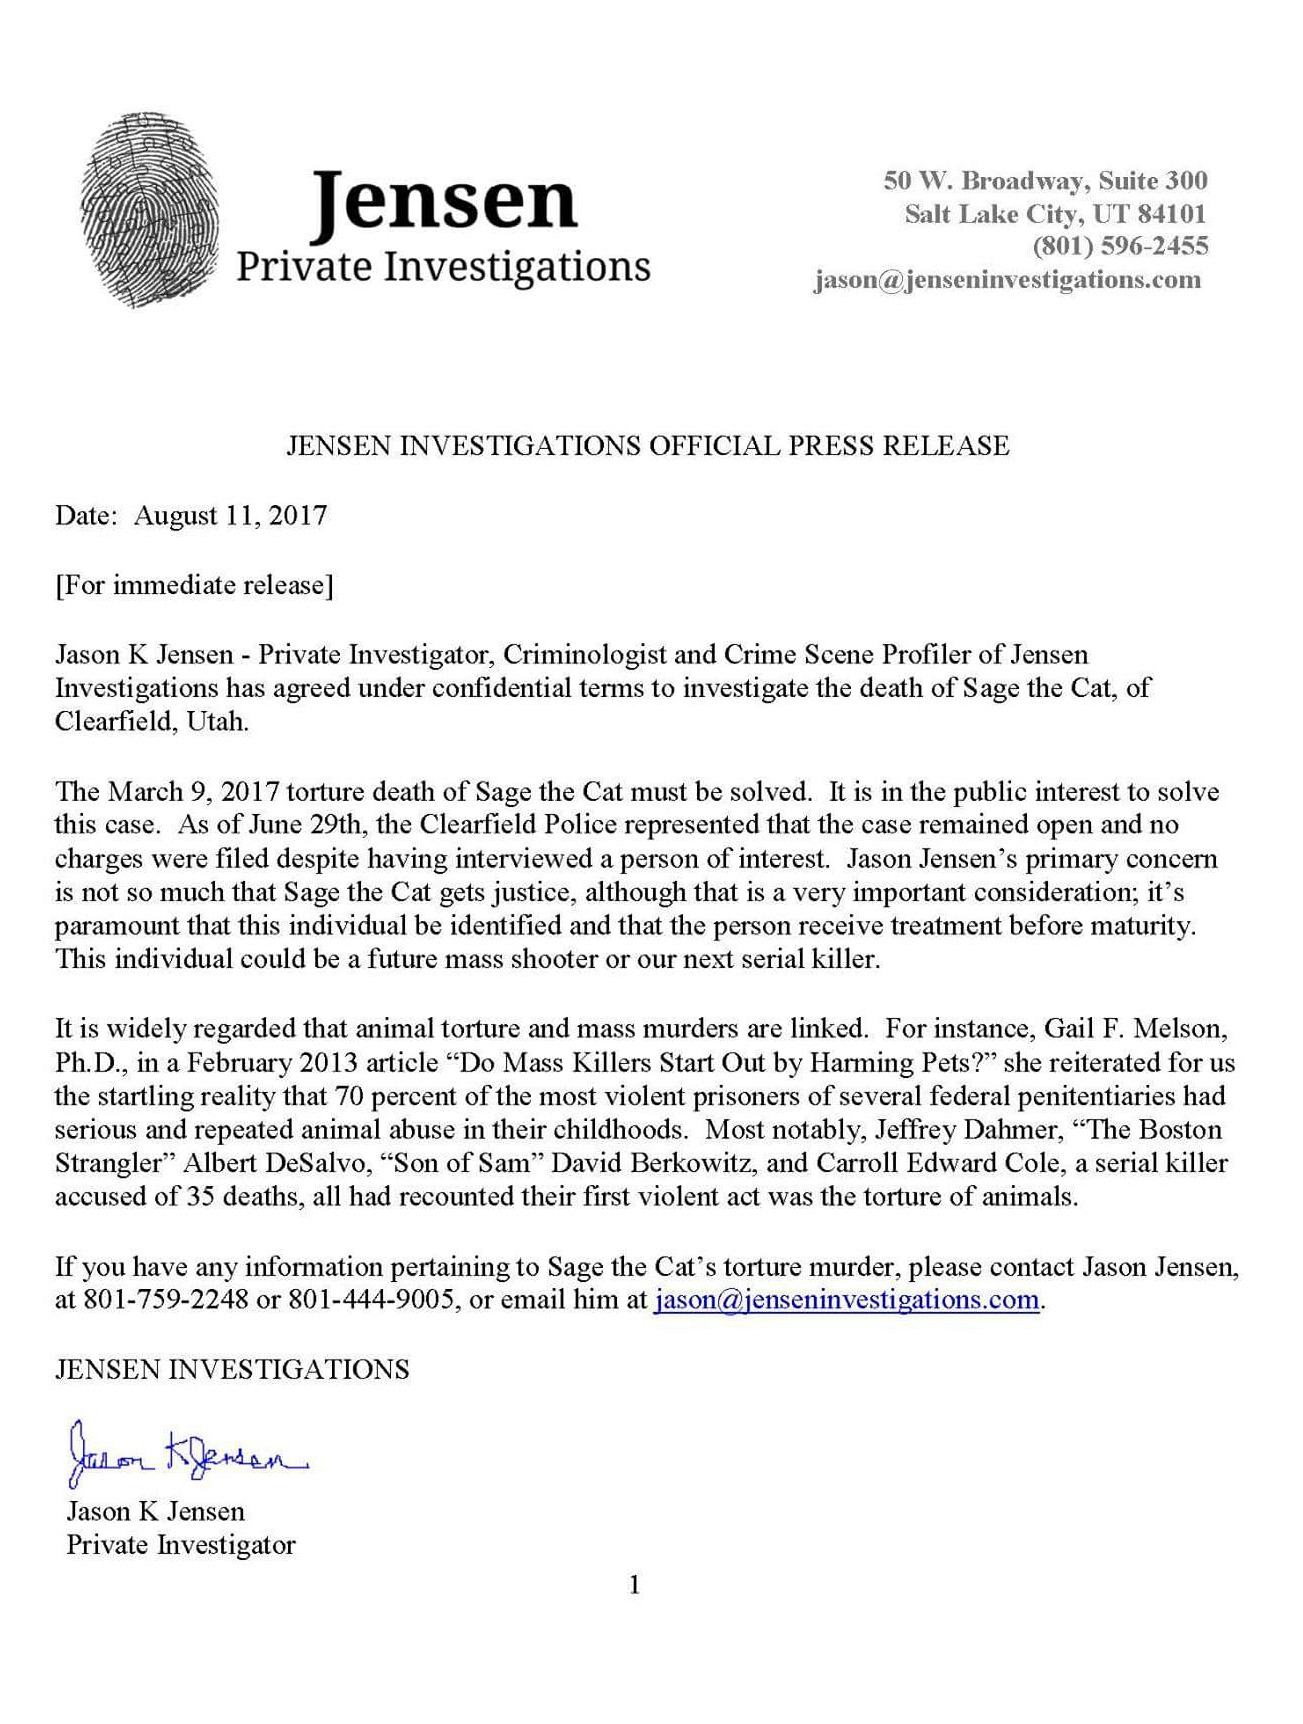 jason k jensen private investigator director jensen